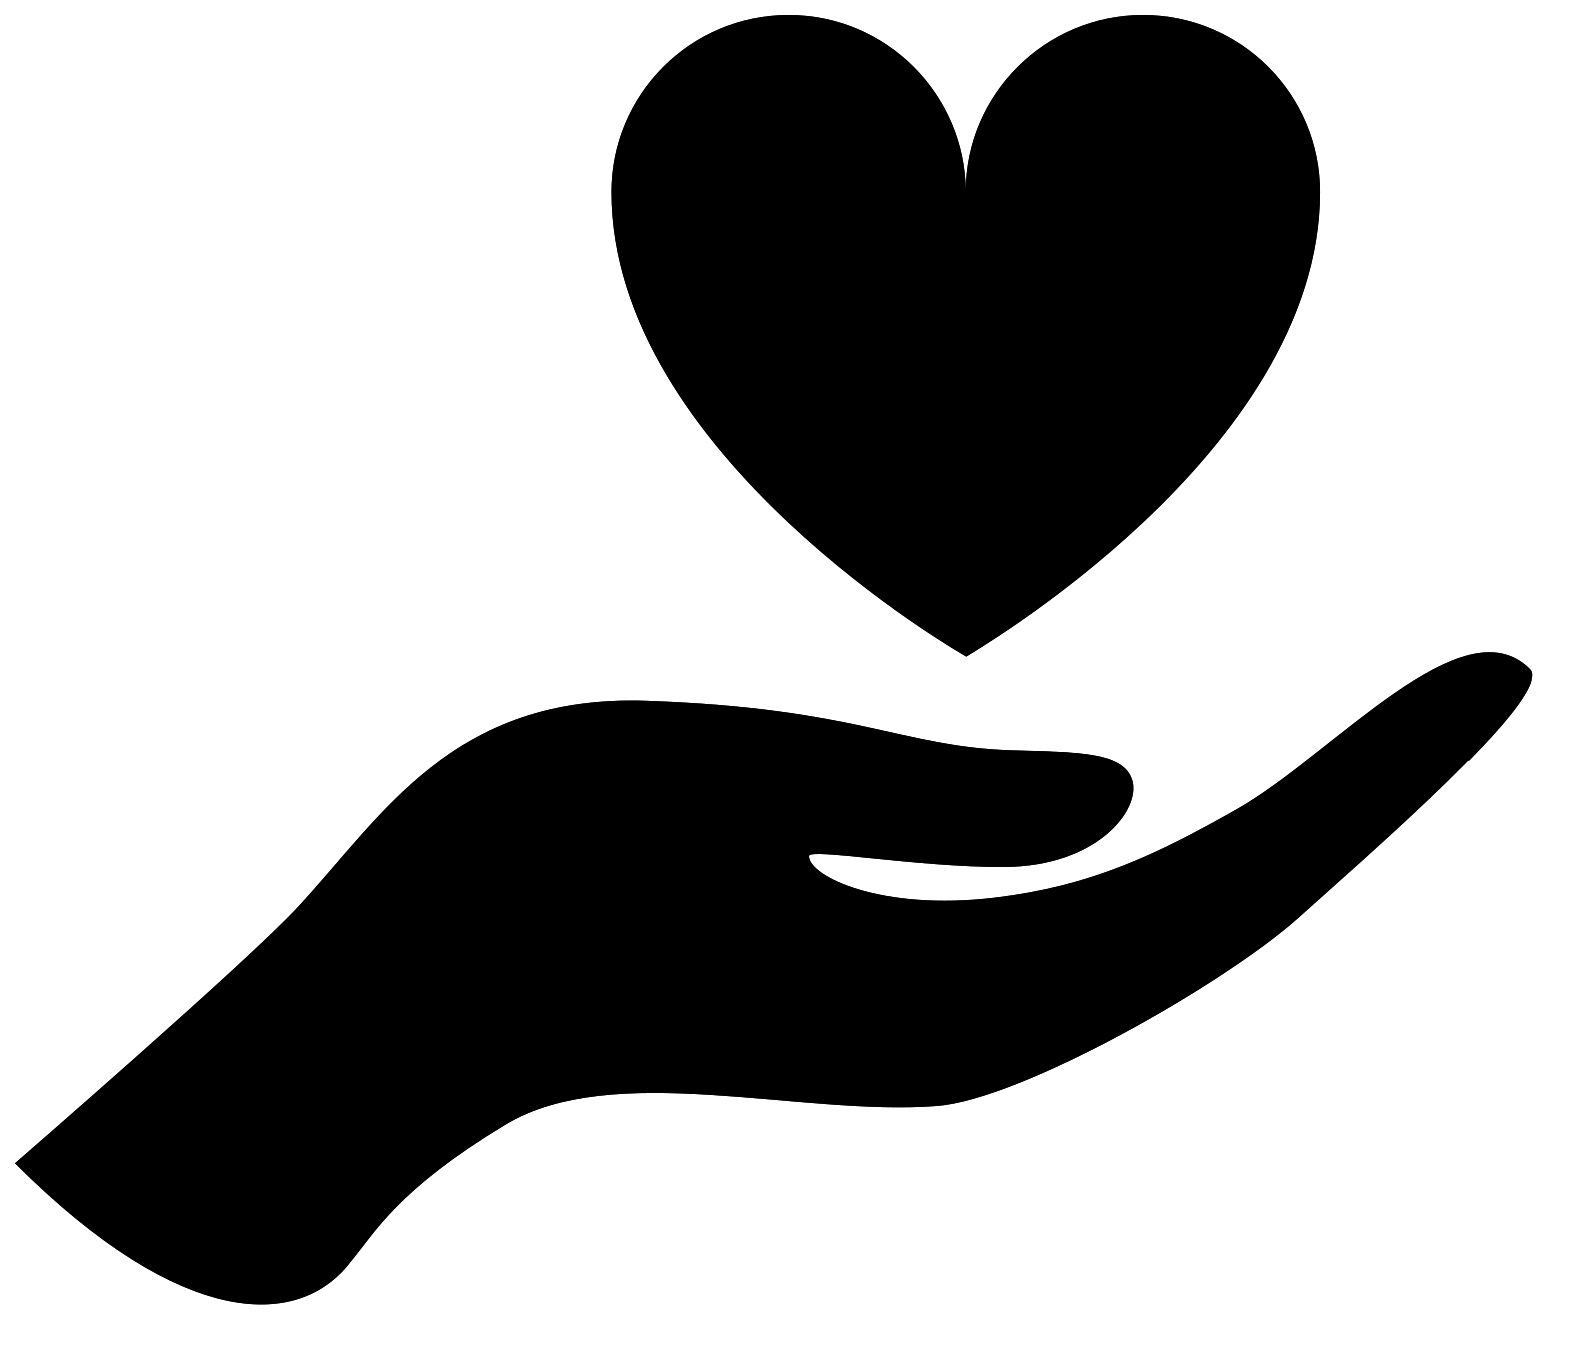 Donation Symbol PNG Free Image